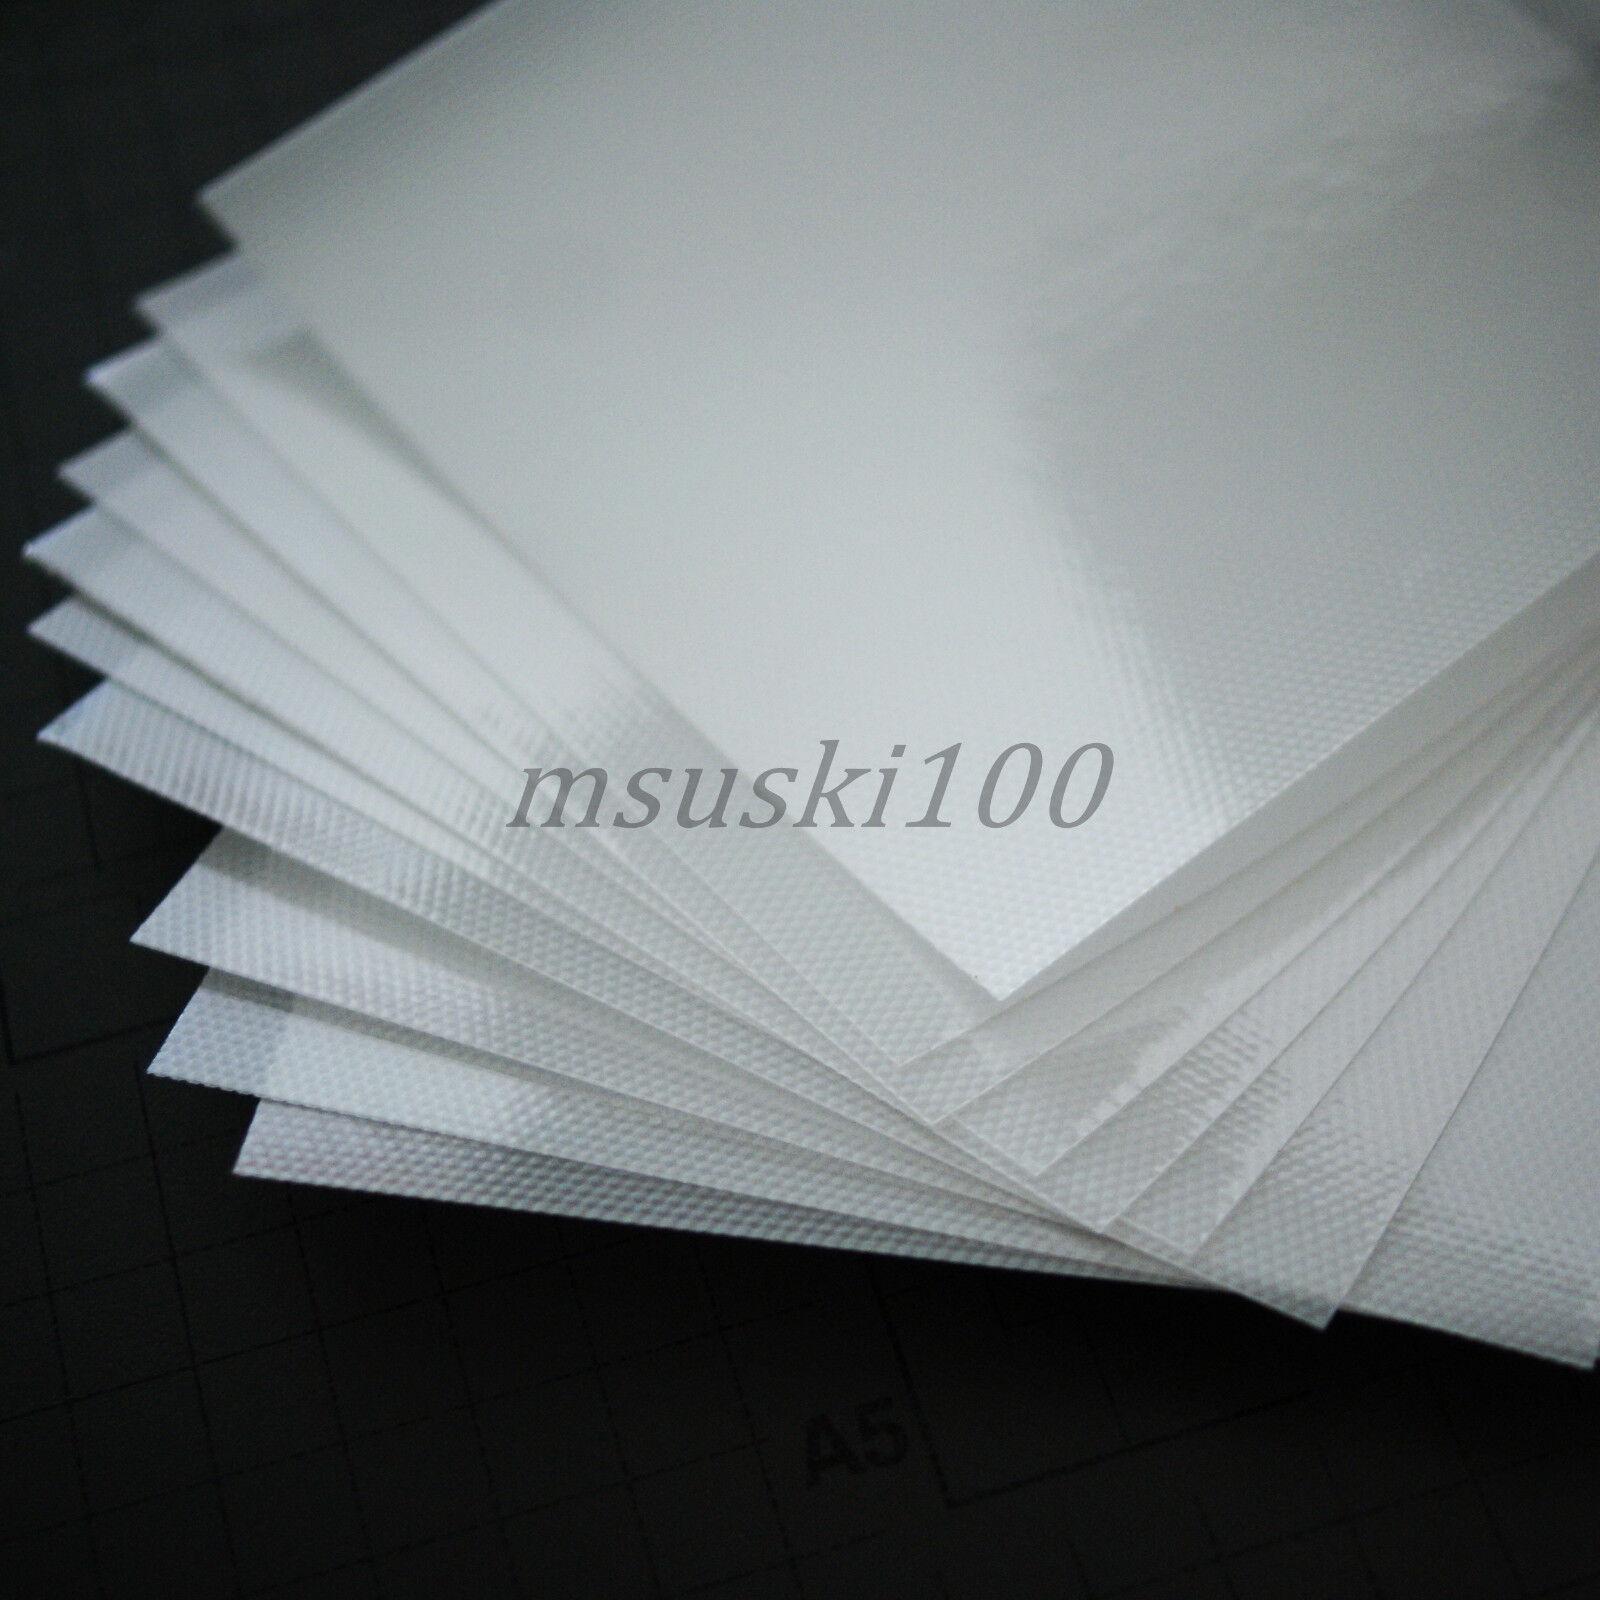 Hot Fix Transfer Mylar Acrylic Paper Sheets Rhinestone